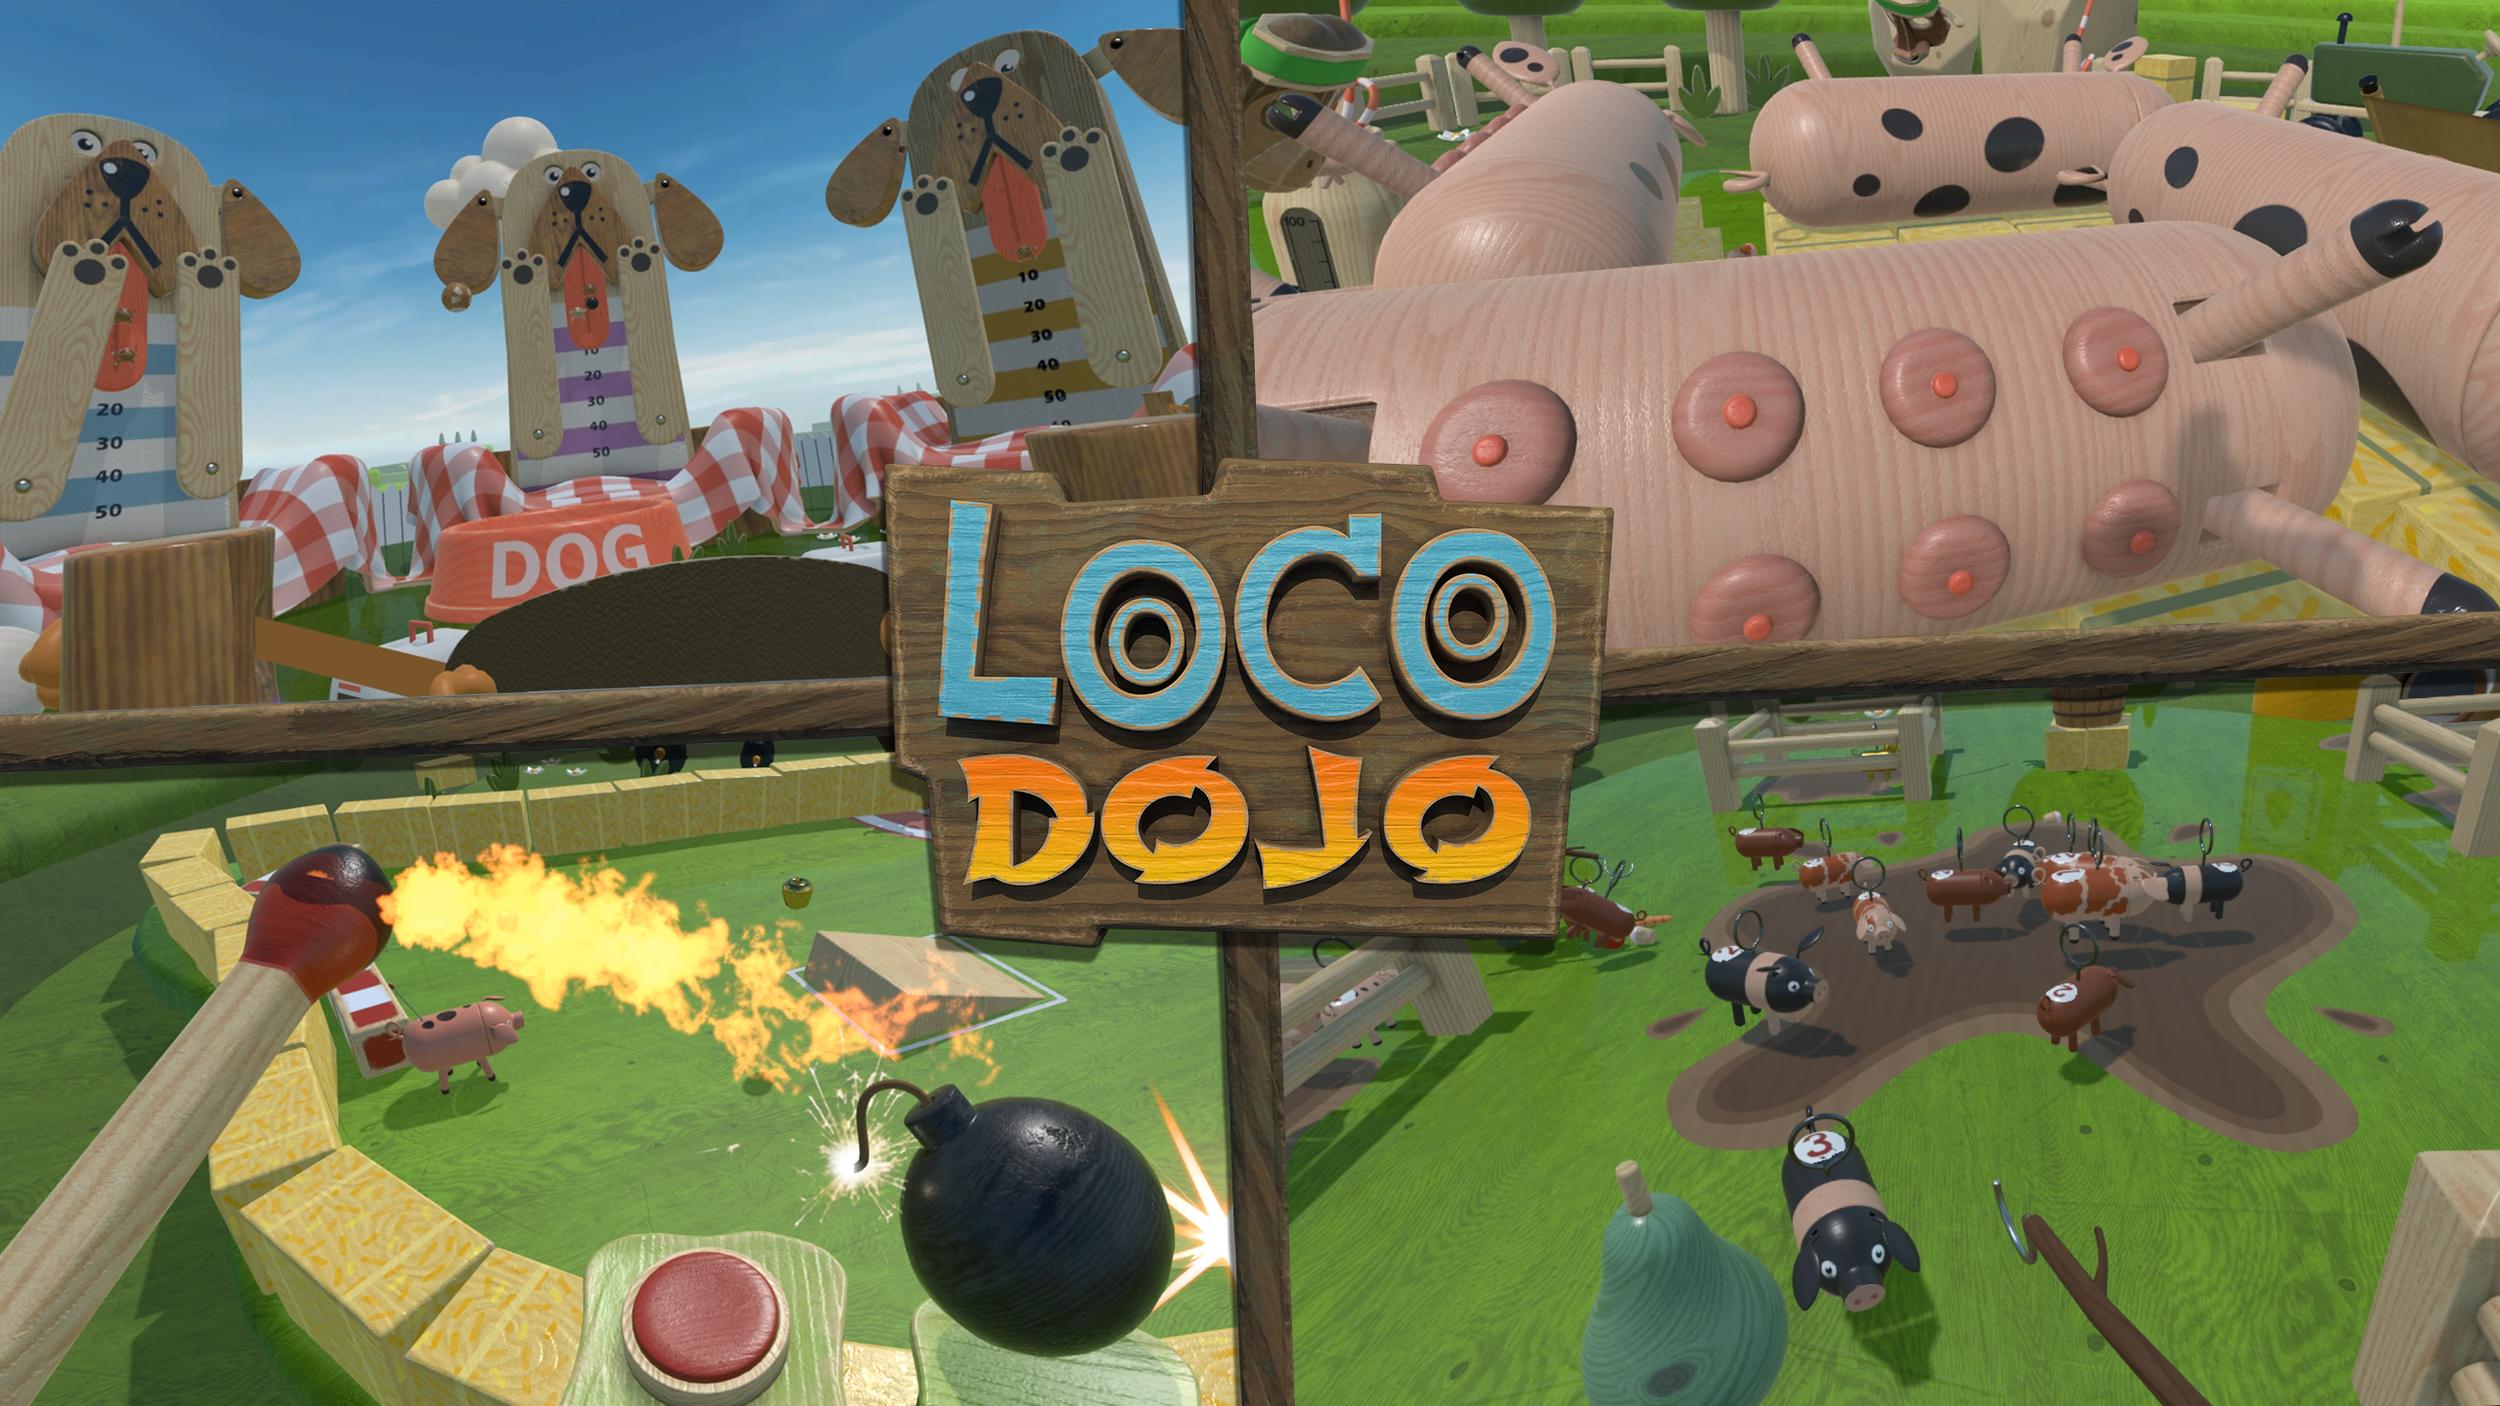 LocoDojoScreenshot_Countryside.png